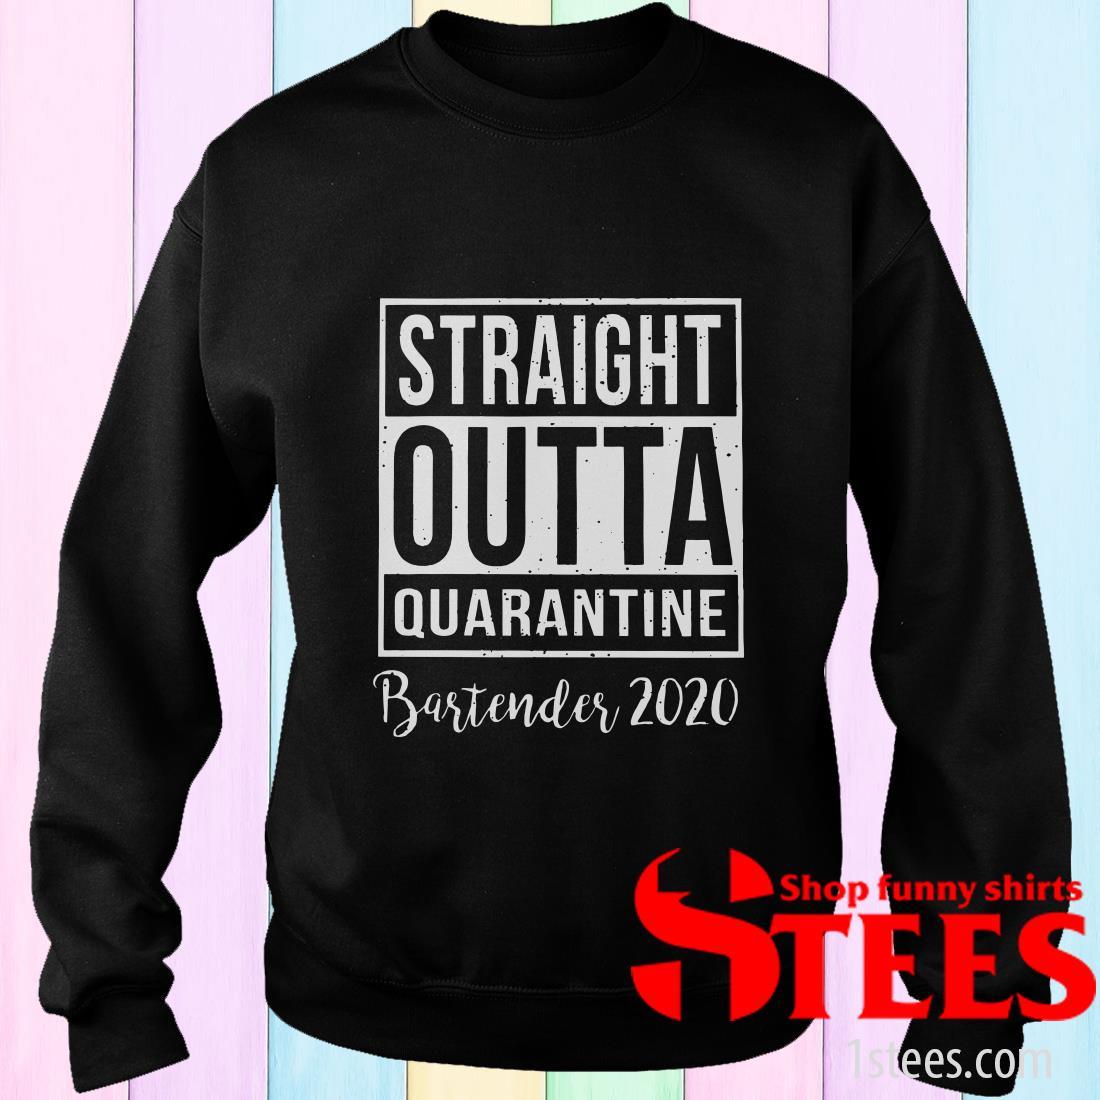 2020 Straight Outta Quarantine Bartender Sweater